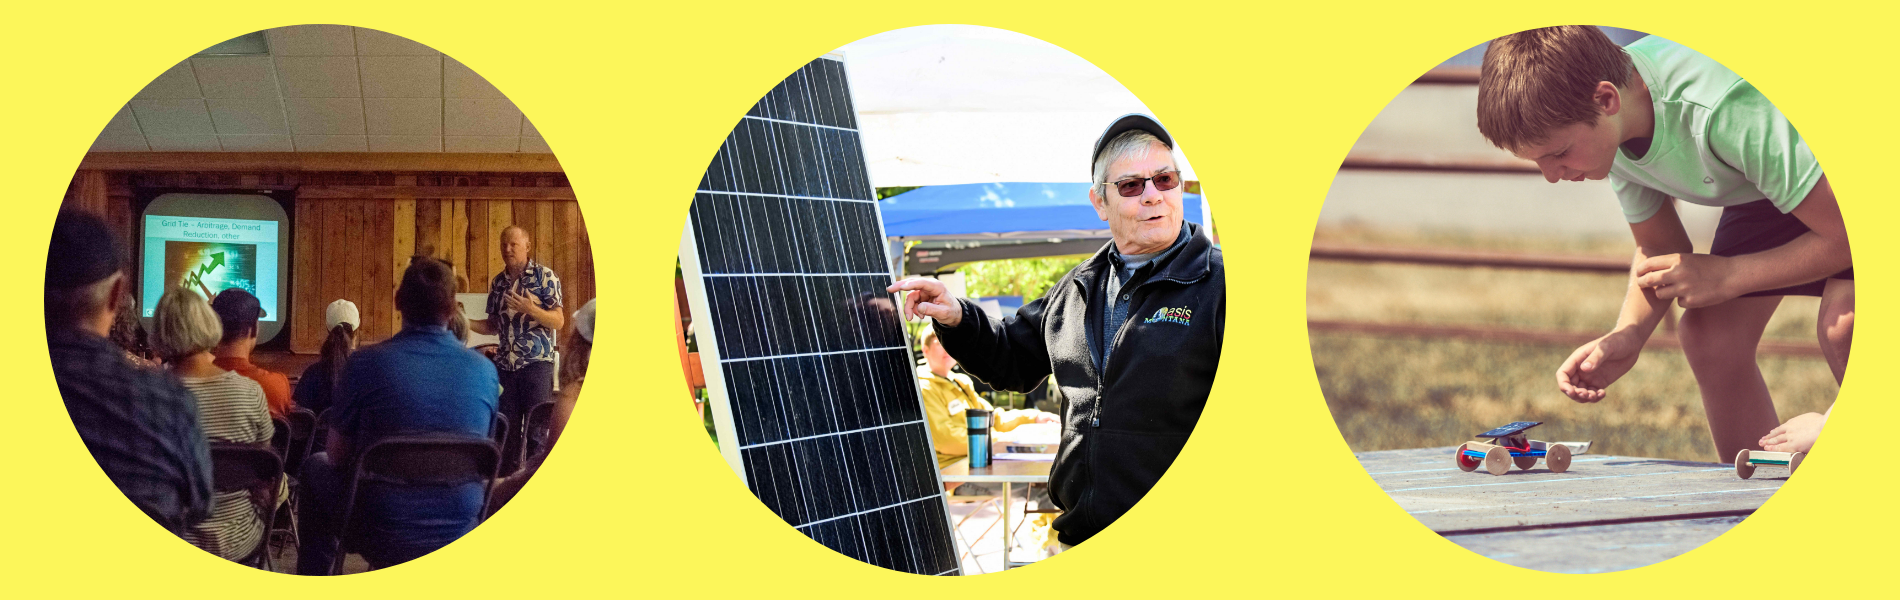 Clean Energy Fair 2019